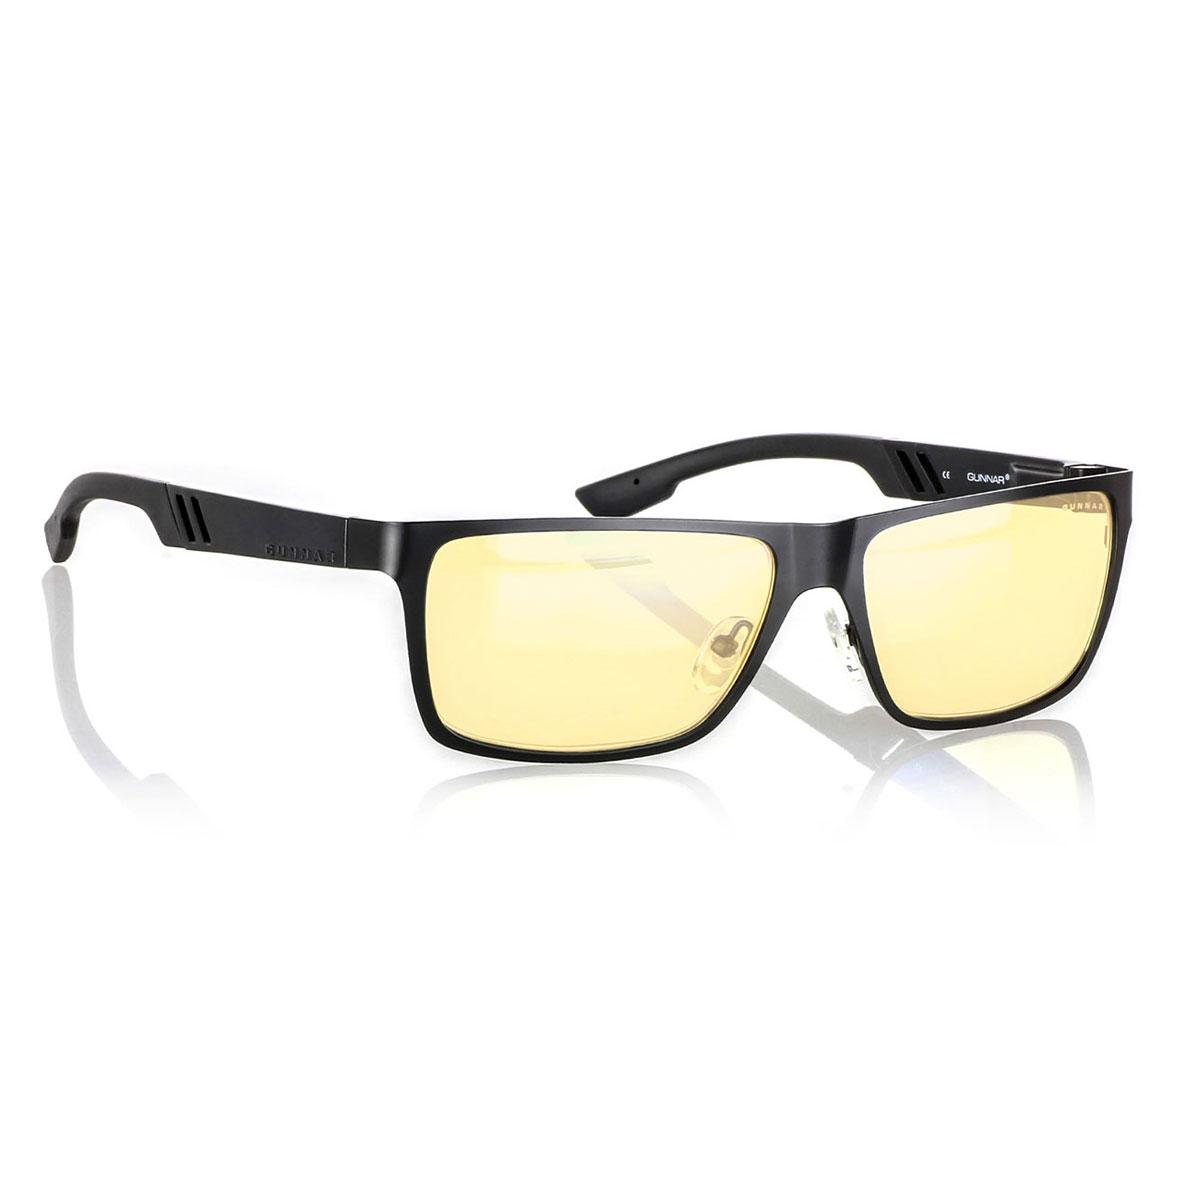 gunnar vinyl onyx lunettes de protection gunnar sur. Black Bedroom Furniture Sets. Home Design Ideas